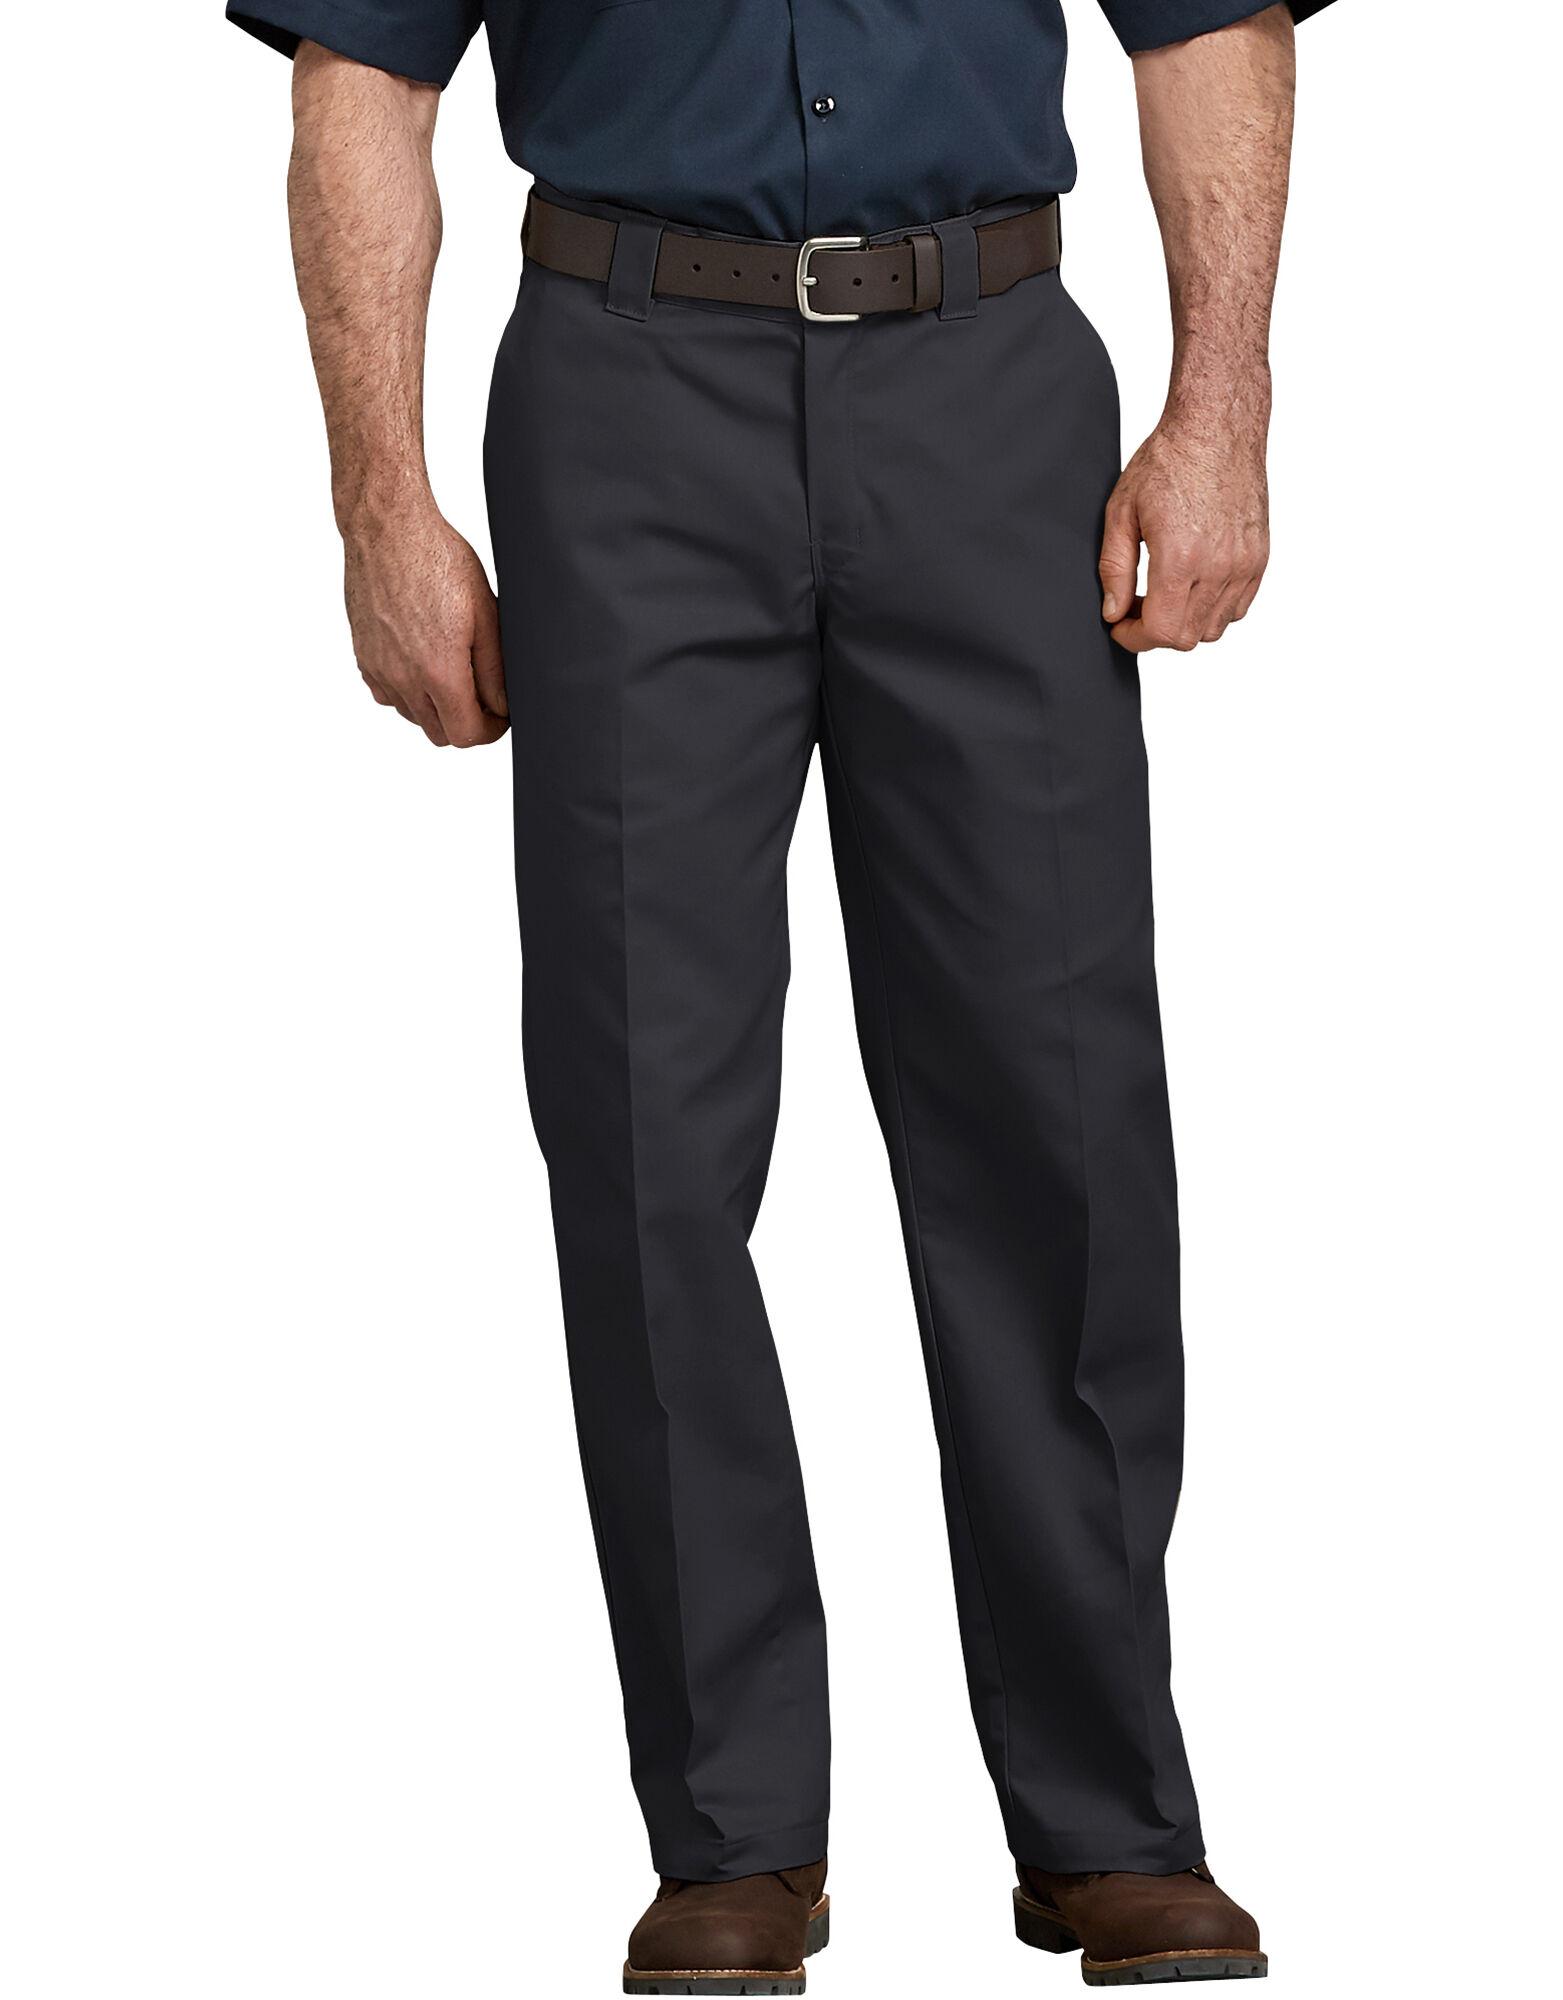 Black Work Jeans 1Kta87O3